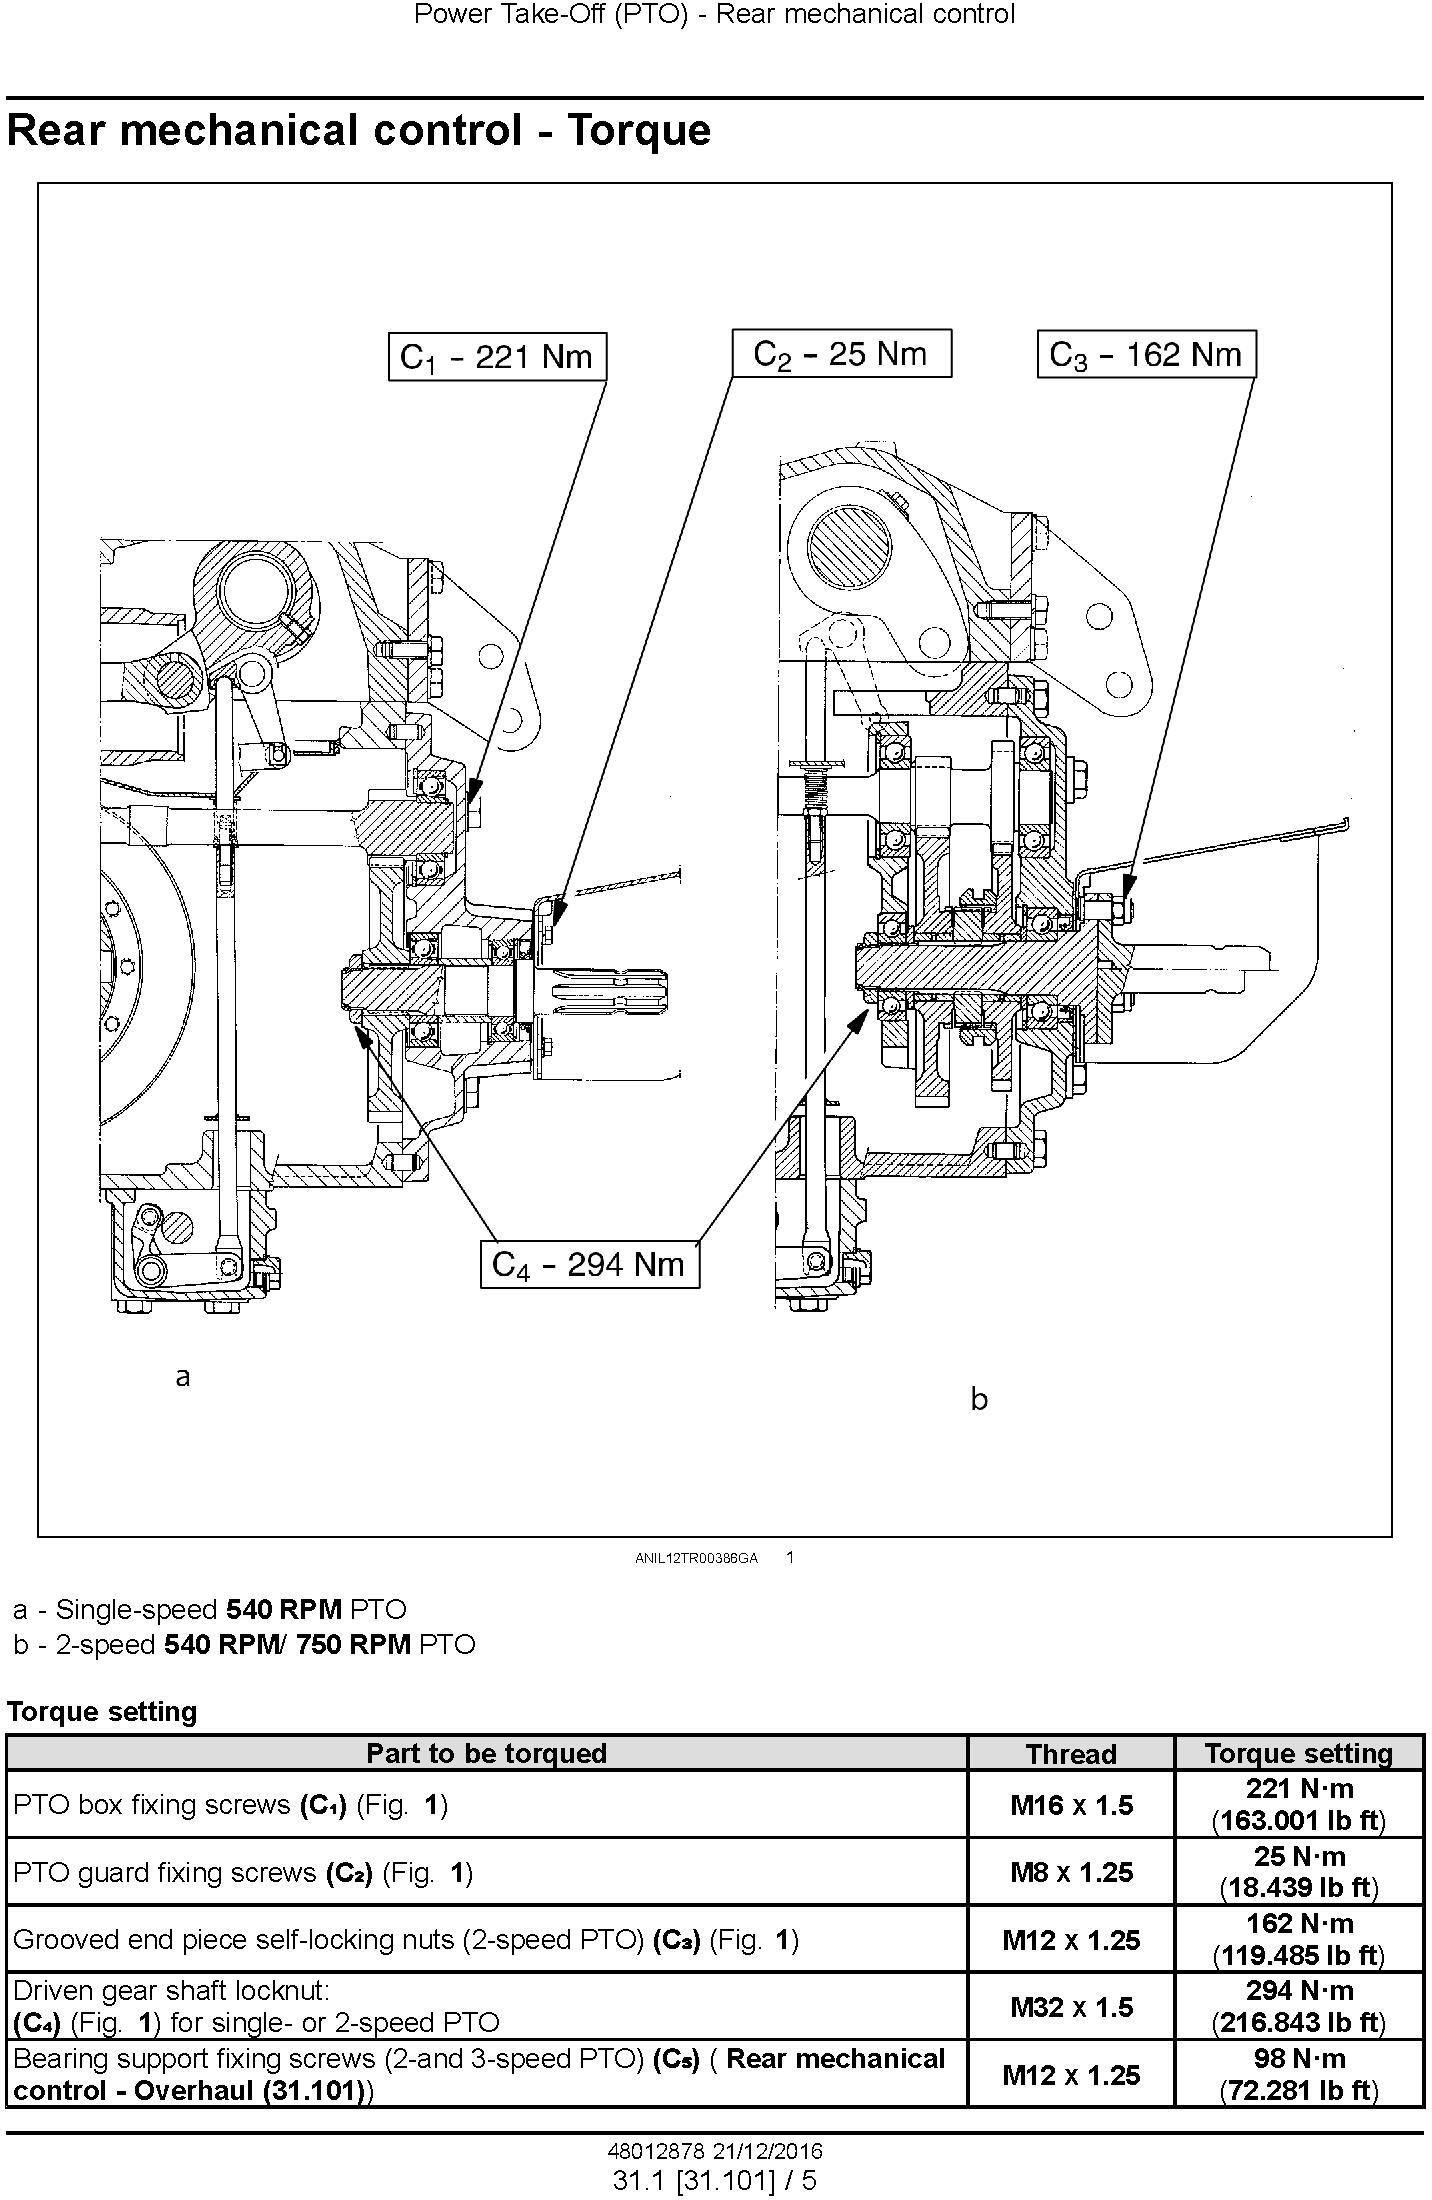 New Holland TD5.65, TD5.75, TD5.80, TD5.90, TD5.100M, TD5.110 Tractors Service Manual - 3